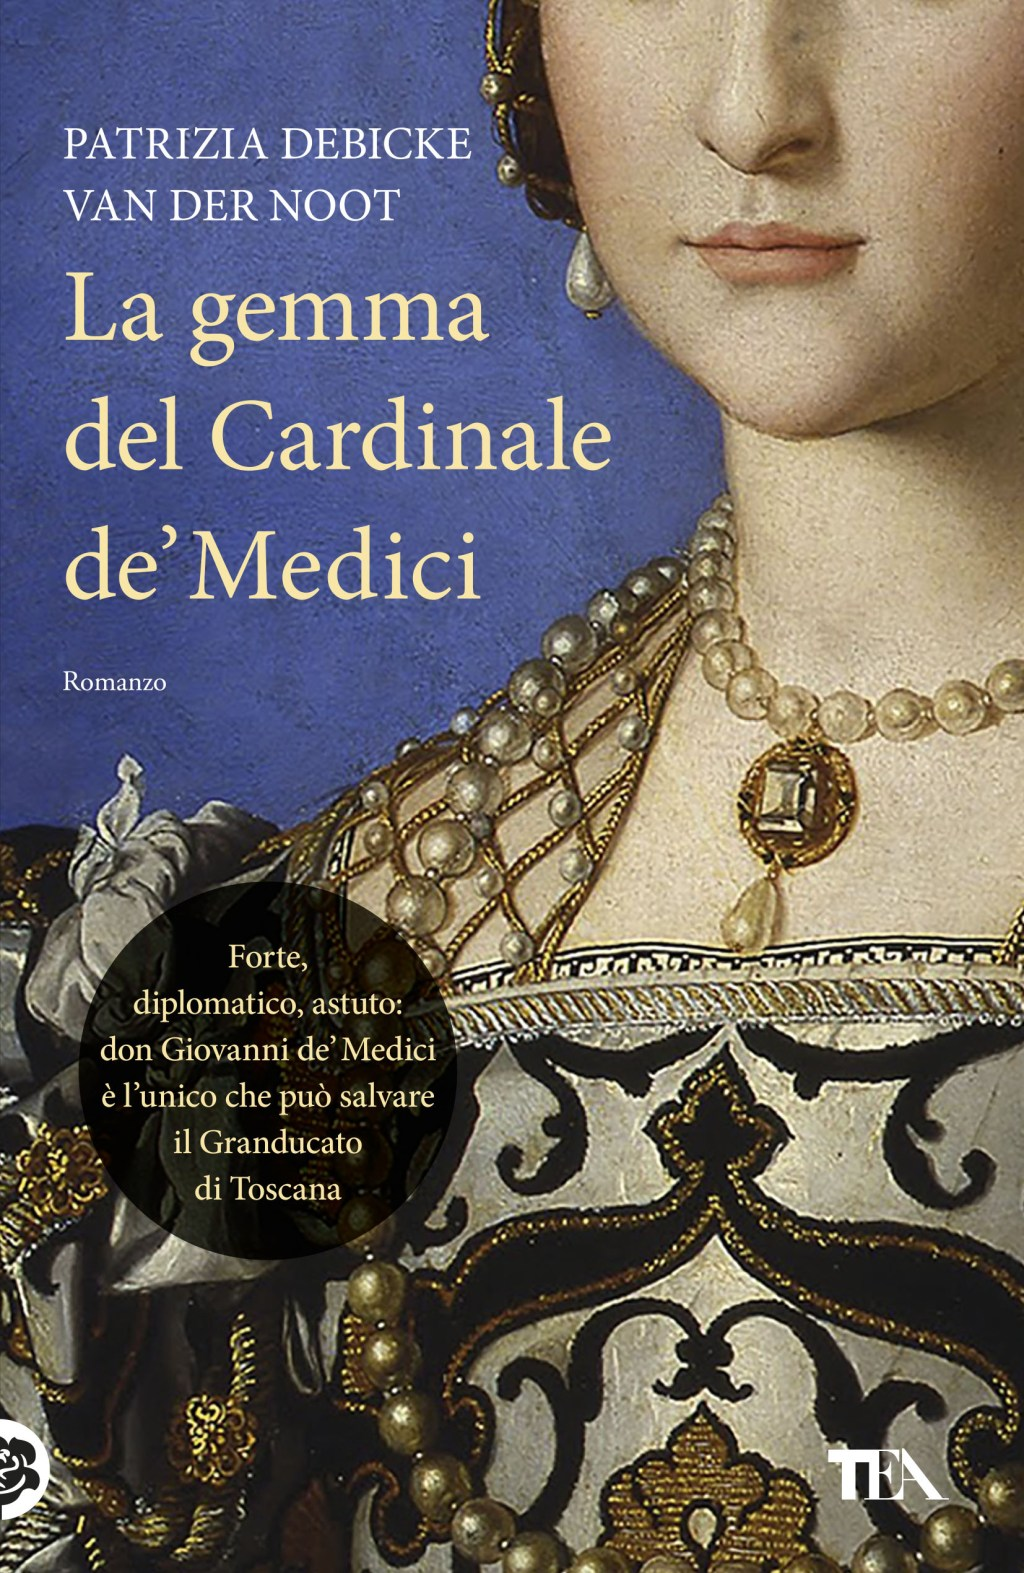 "Risultati immagini per ""La gemma del Cardinale de' Medici"", di Patrizia Debicke van der Noot (TEA)"